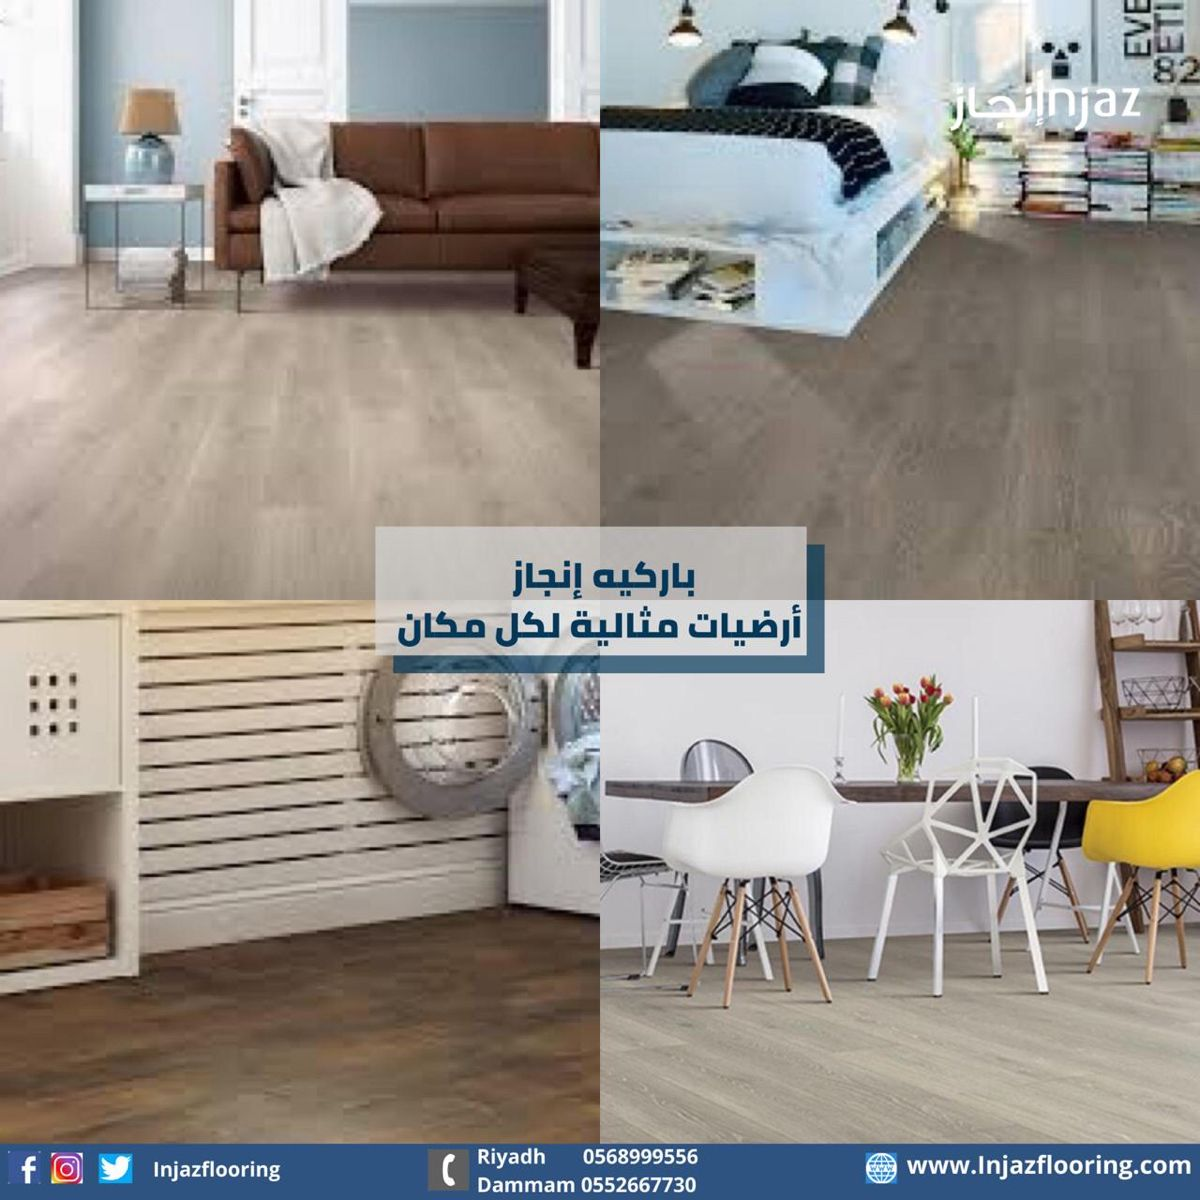 أرضيات إنجاز مثالية لكل مكان Wood Laminate Flooring Wood Laminate Laminate Flooring